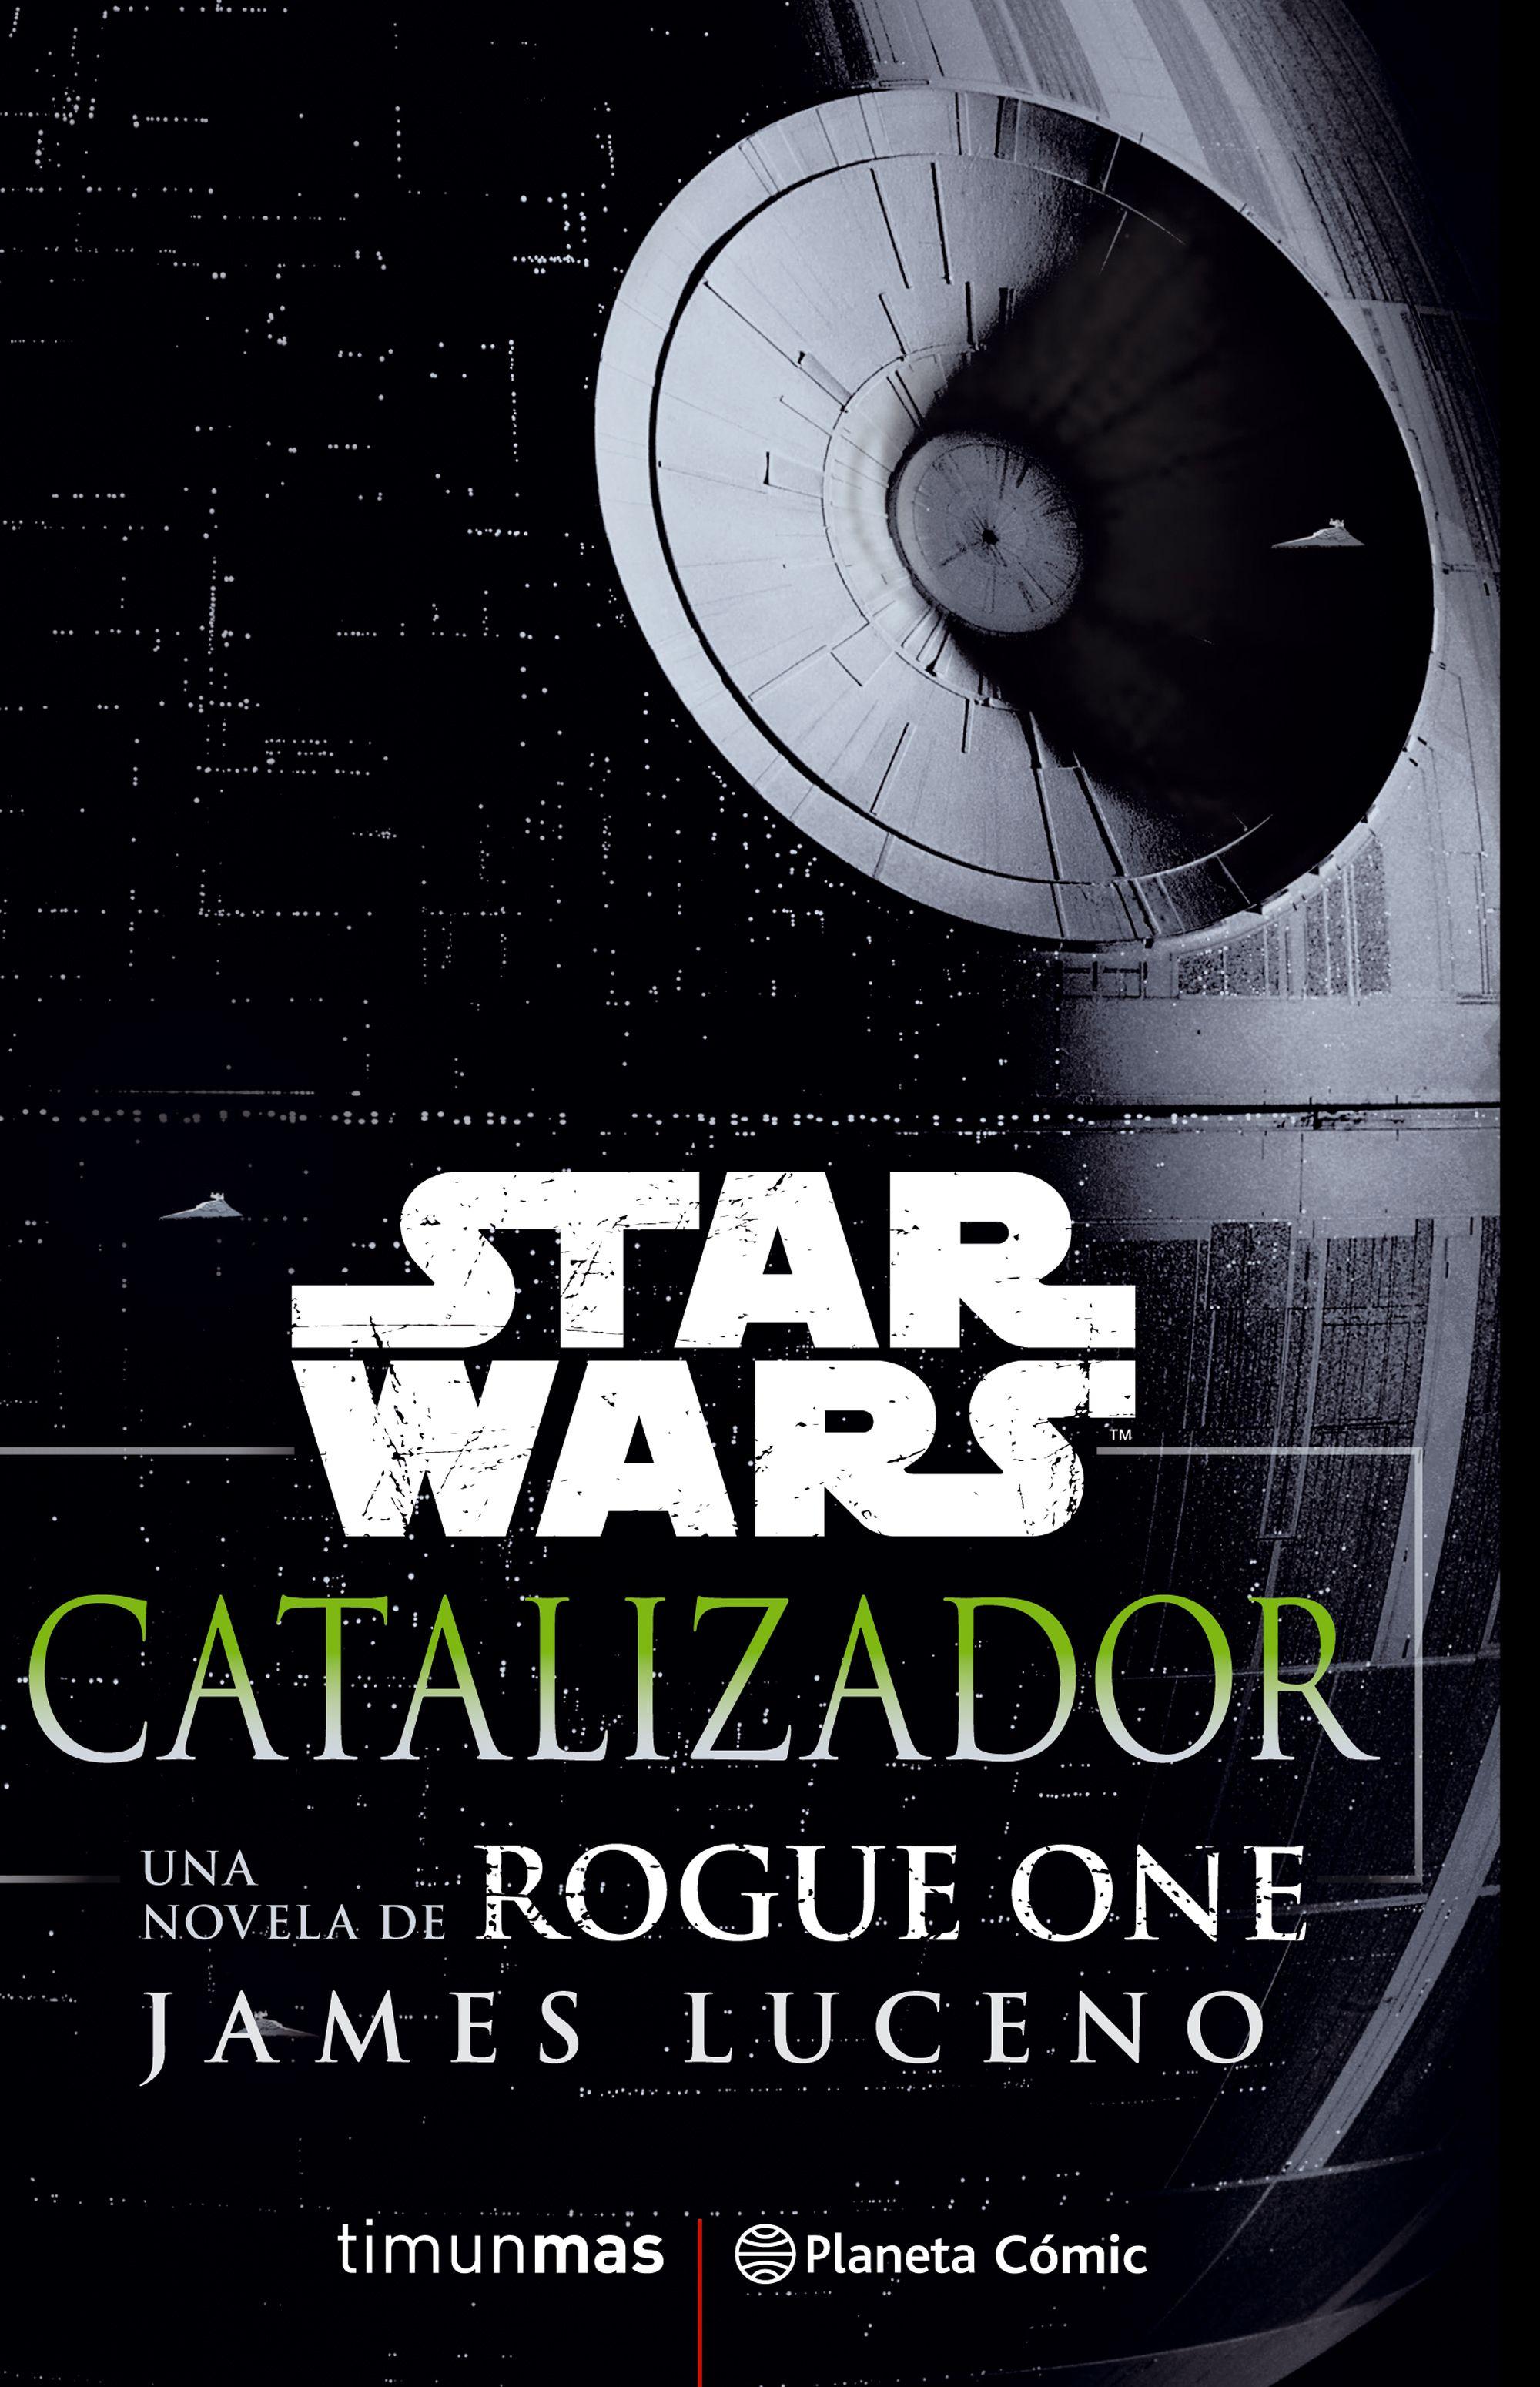 STAR WARS ROGUE ONE - CATALIZADOR